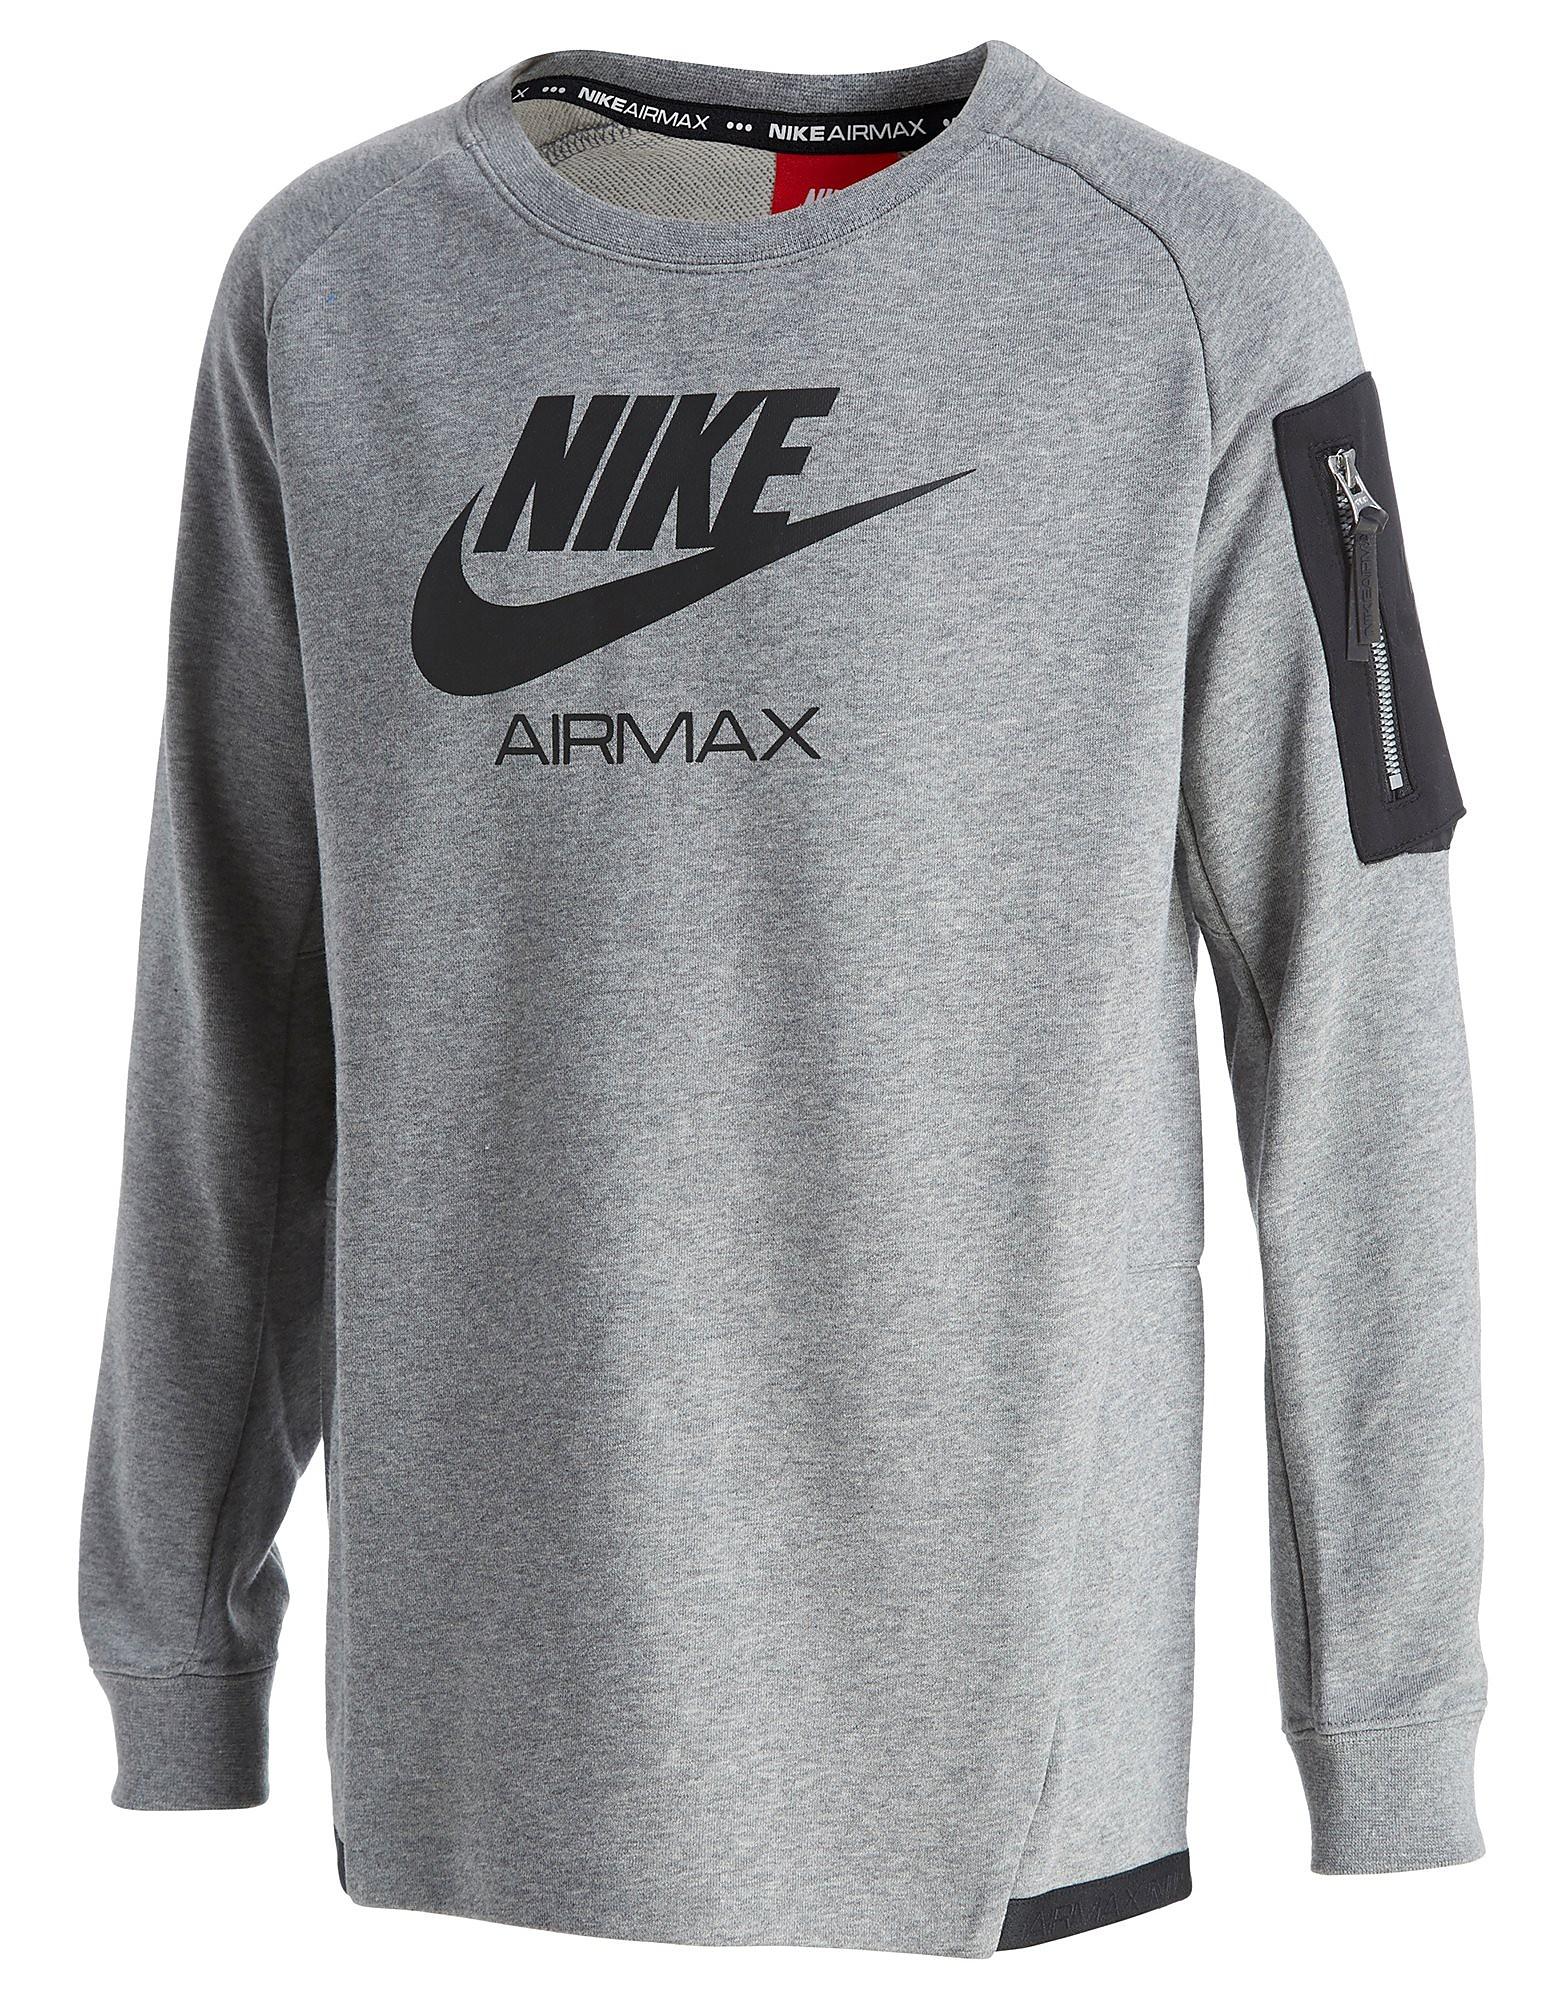 Nike Air Max Rundhalsausschnitt Sweatshirt Junioren